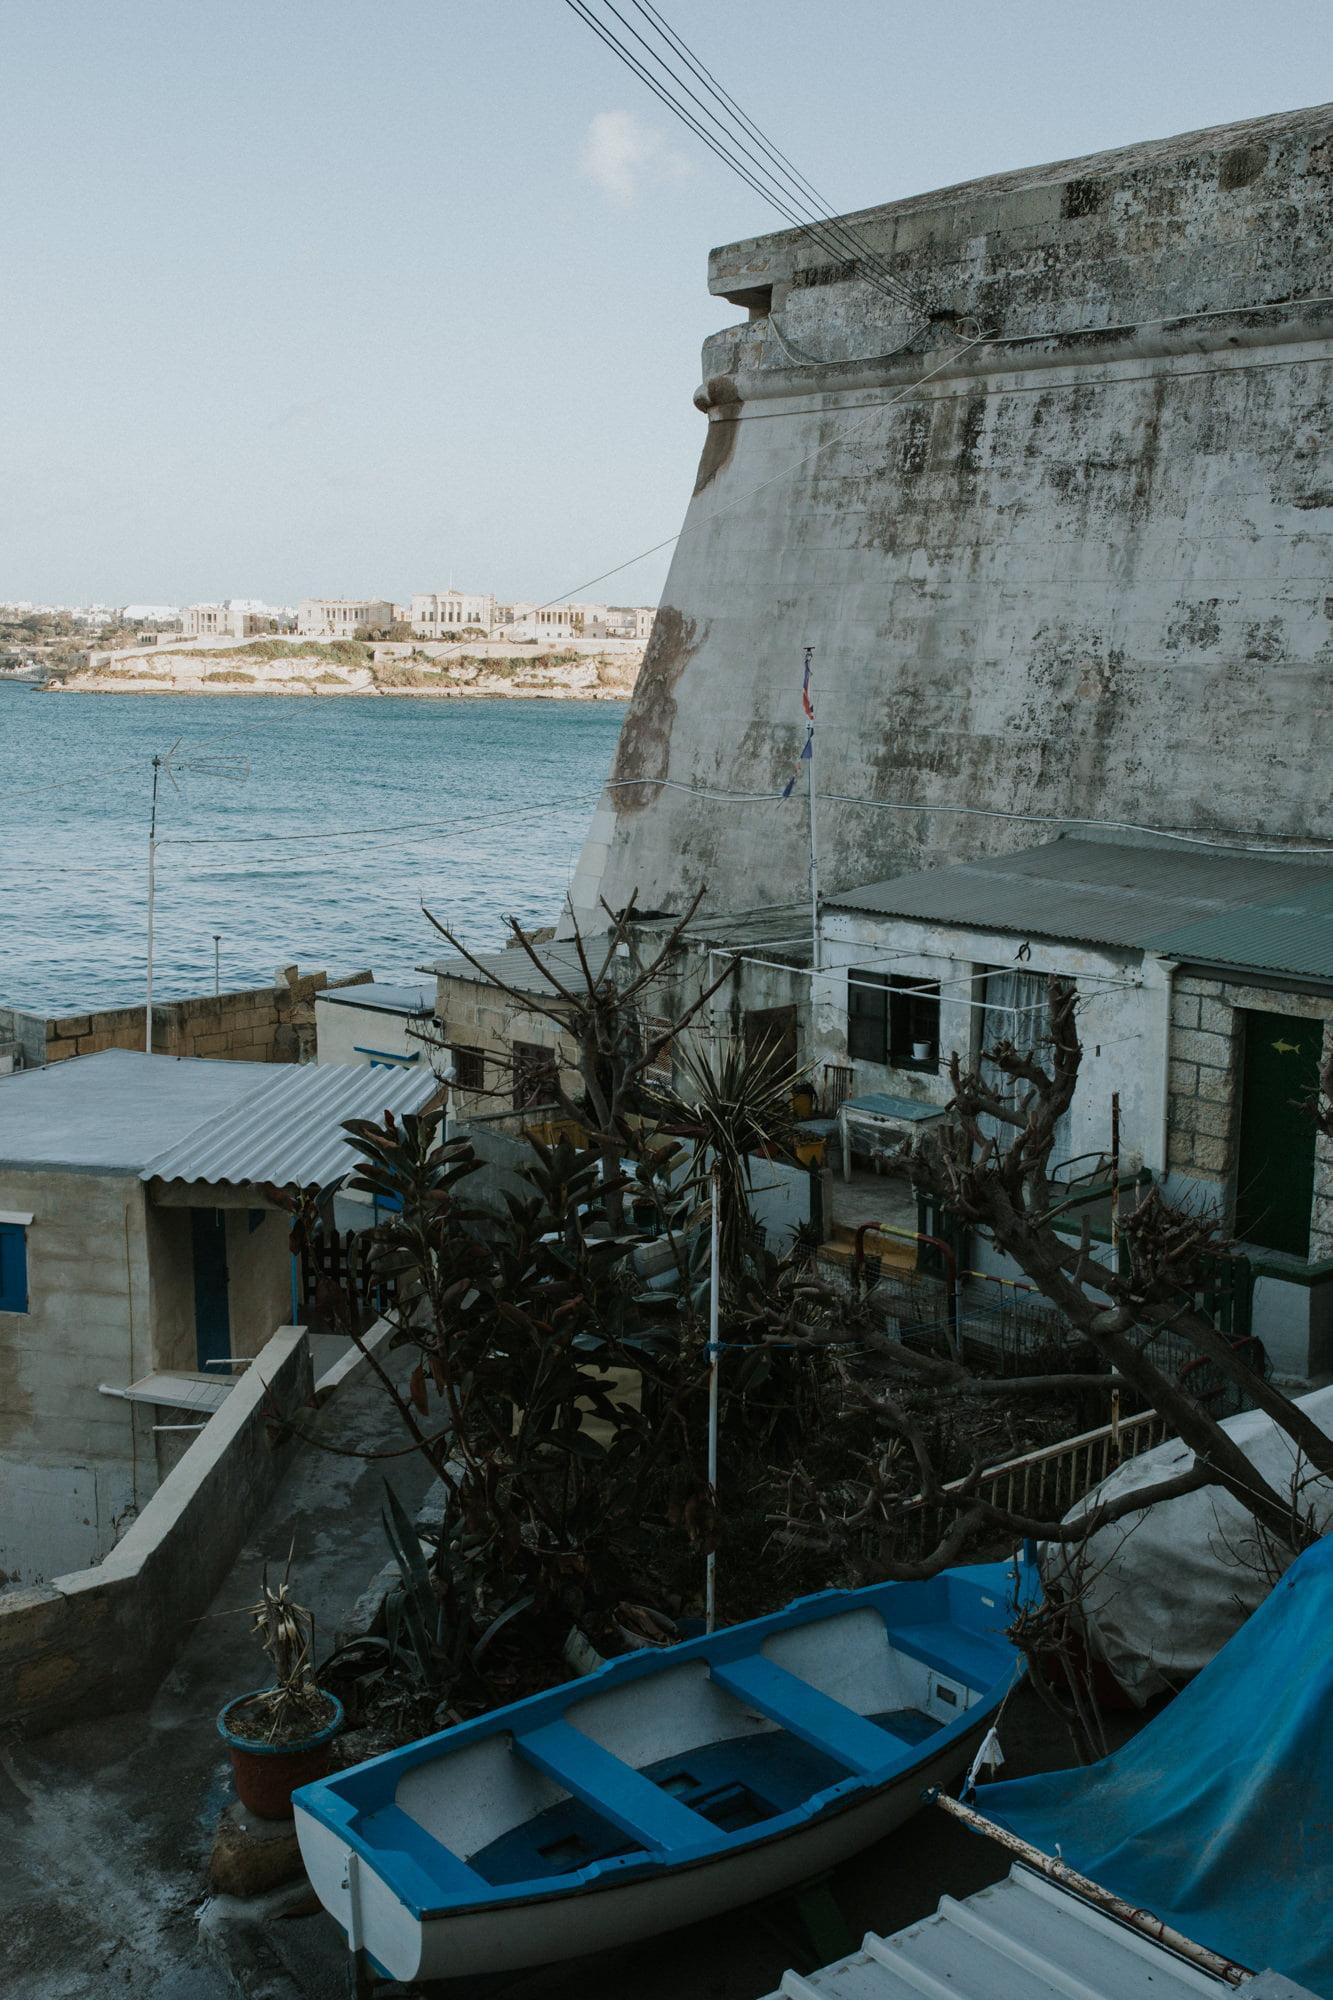 Malta Wedding photographer - Malta, Gozo, Comino 81